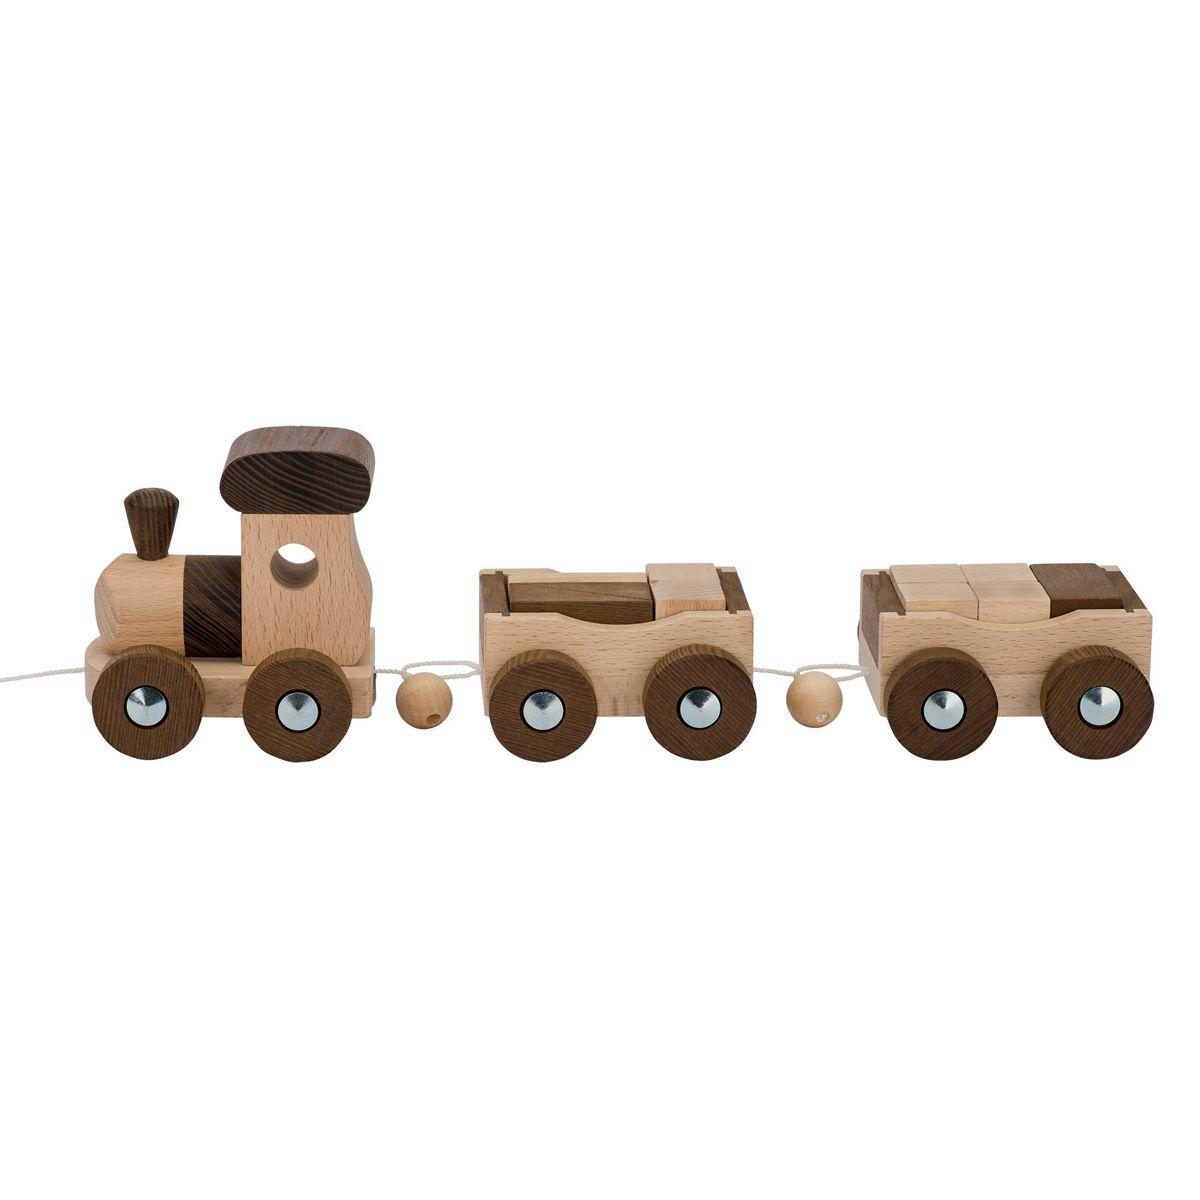 Gokiamsterdamtrain wooden wooden train wood train